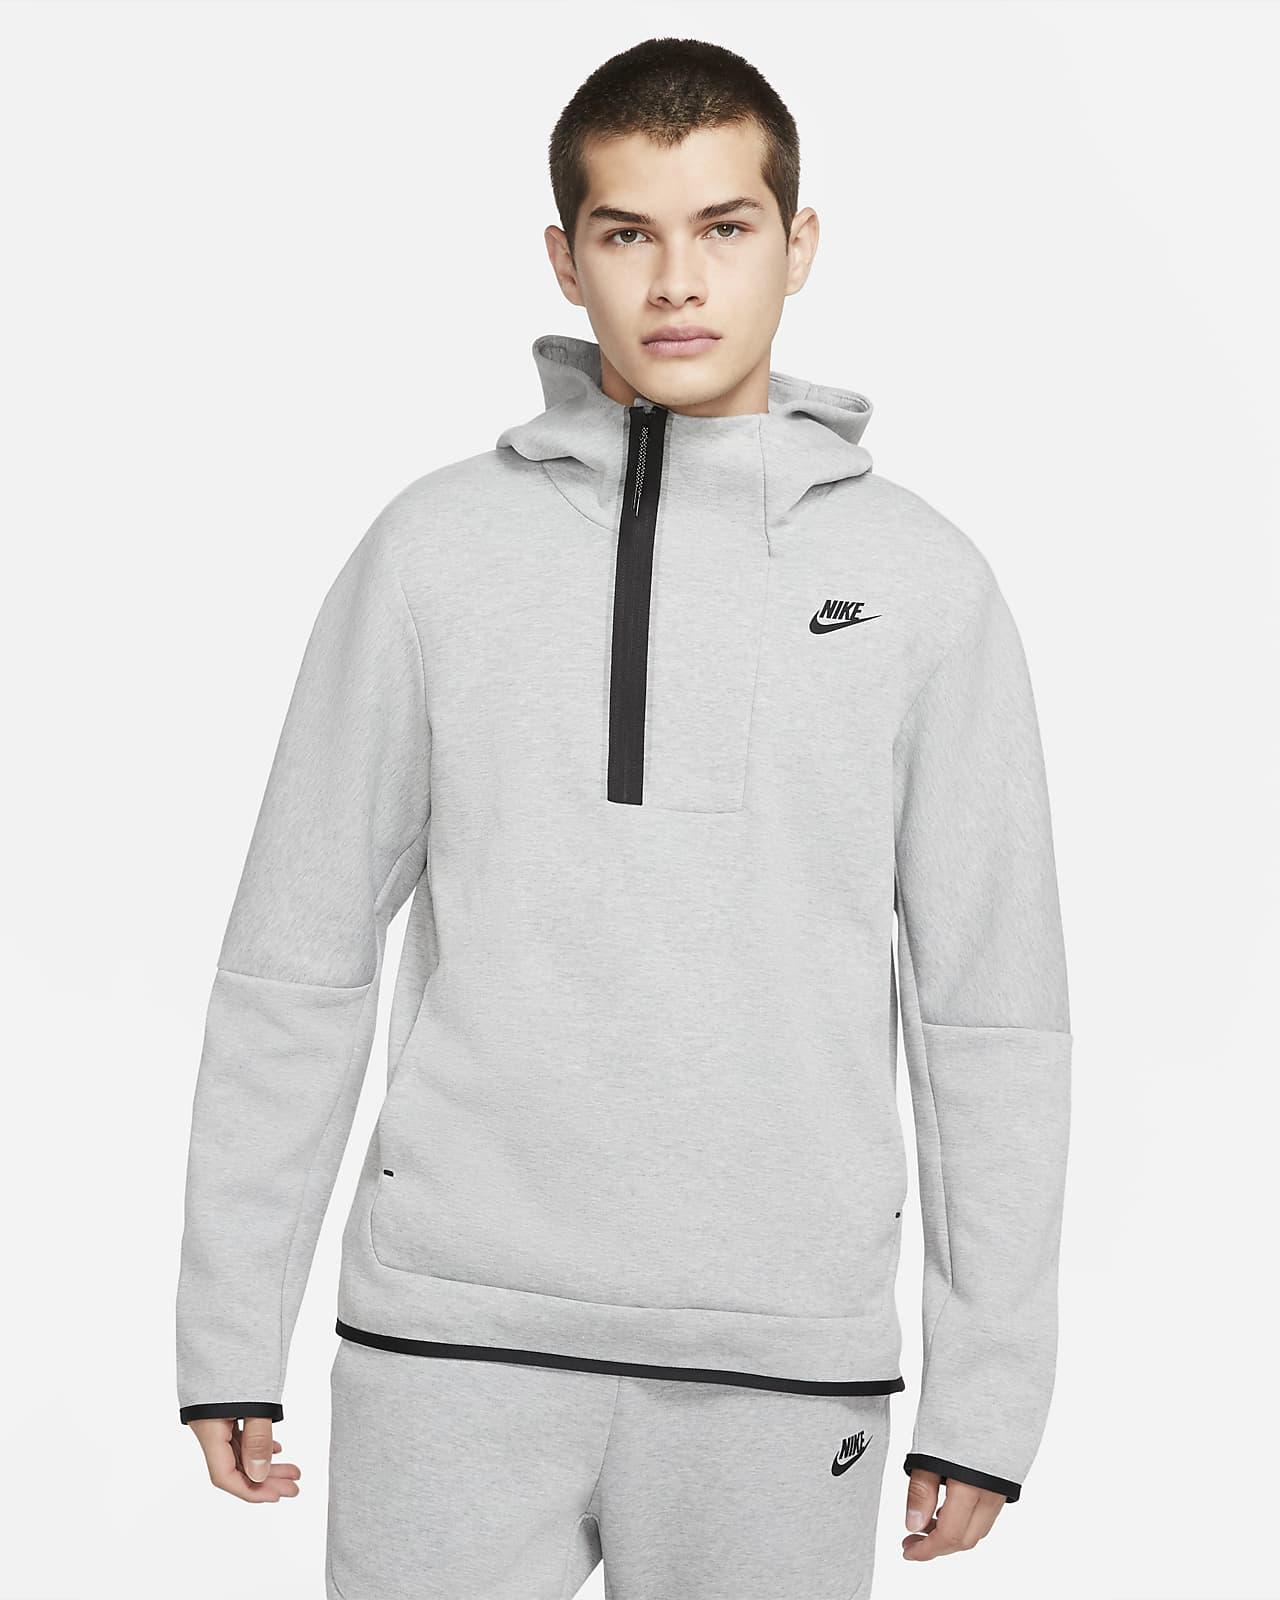 Nike Sportswear Tech Fleece Dessuadora amb caputxa i mitja cremallera - Home